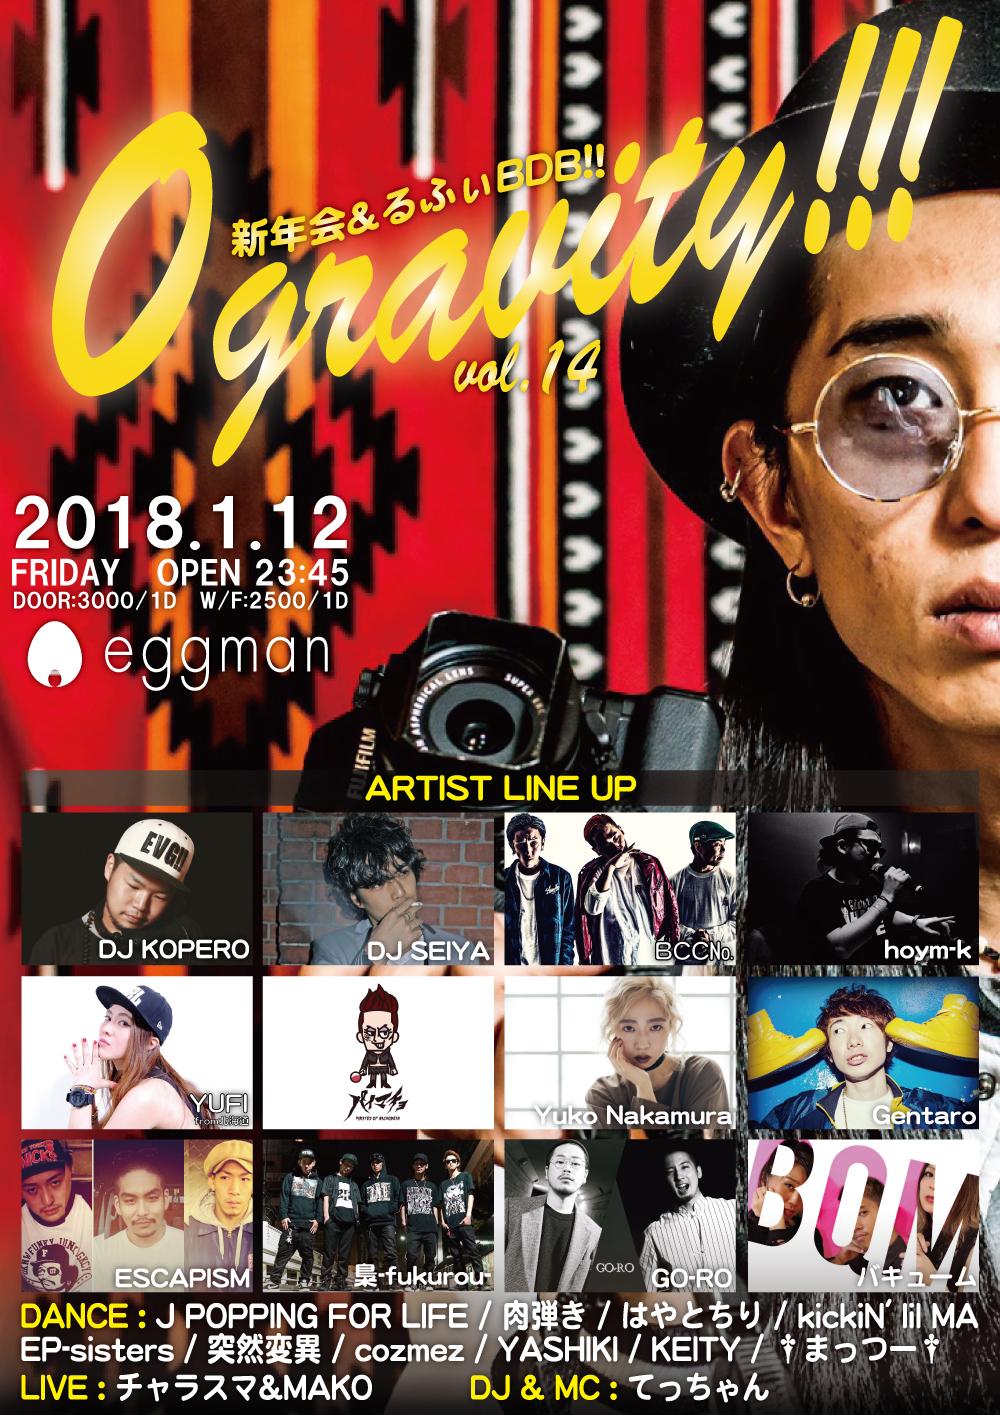 0gravity!!! vol.14 新年会&るふぃBDB SP!!!